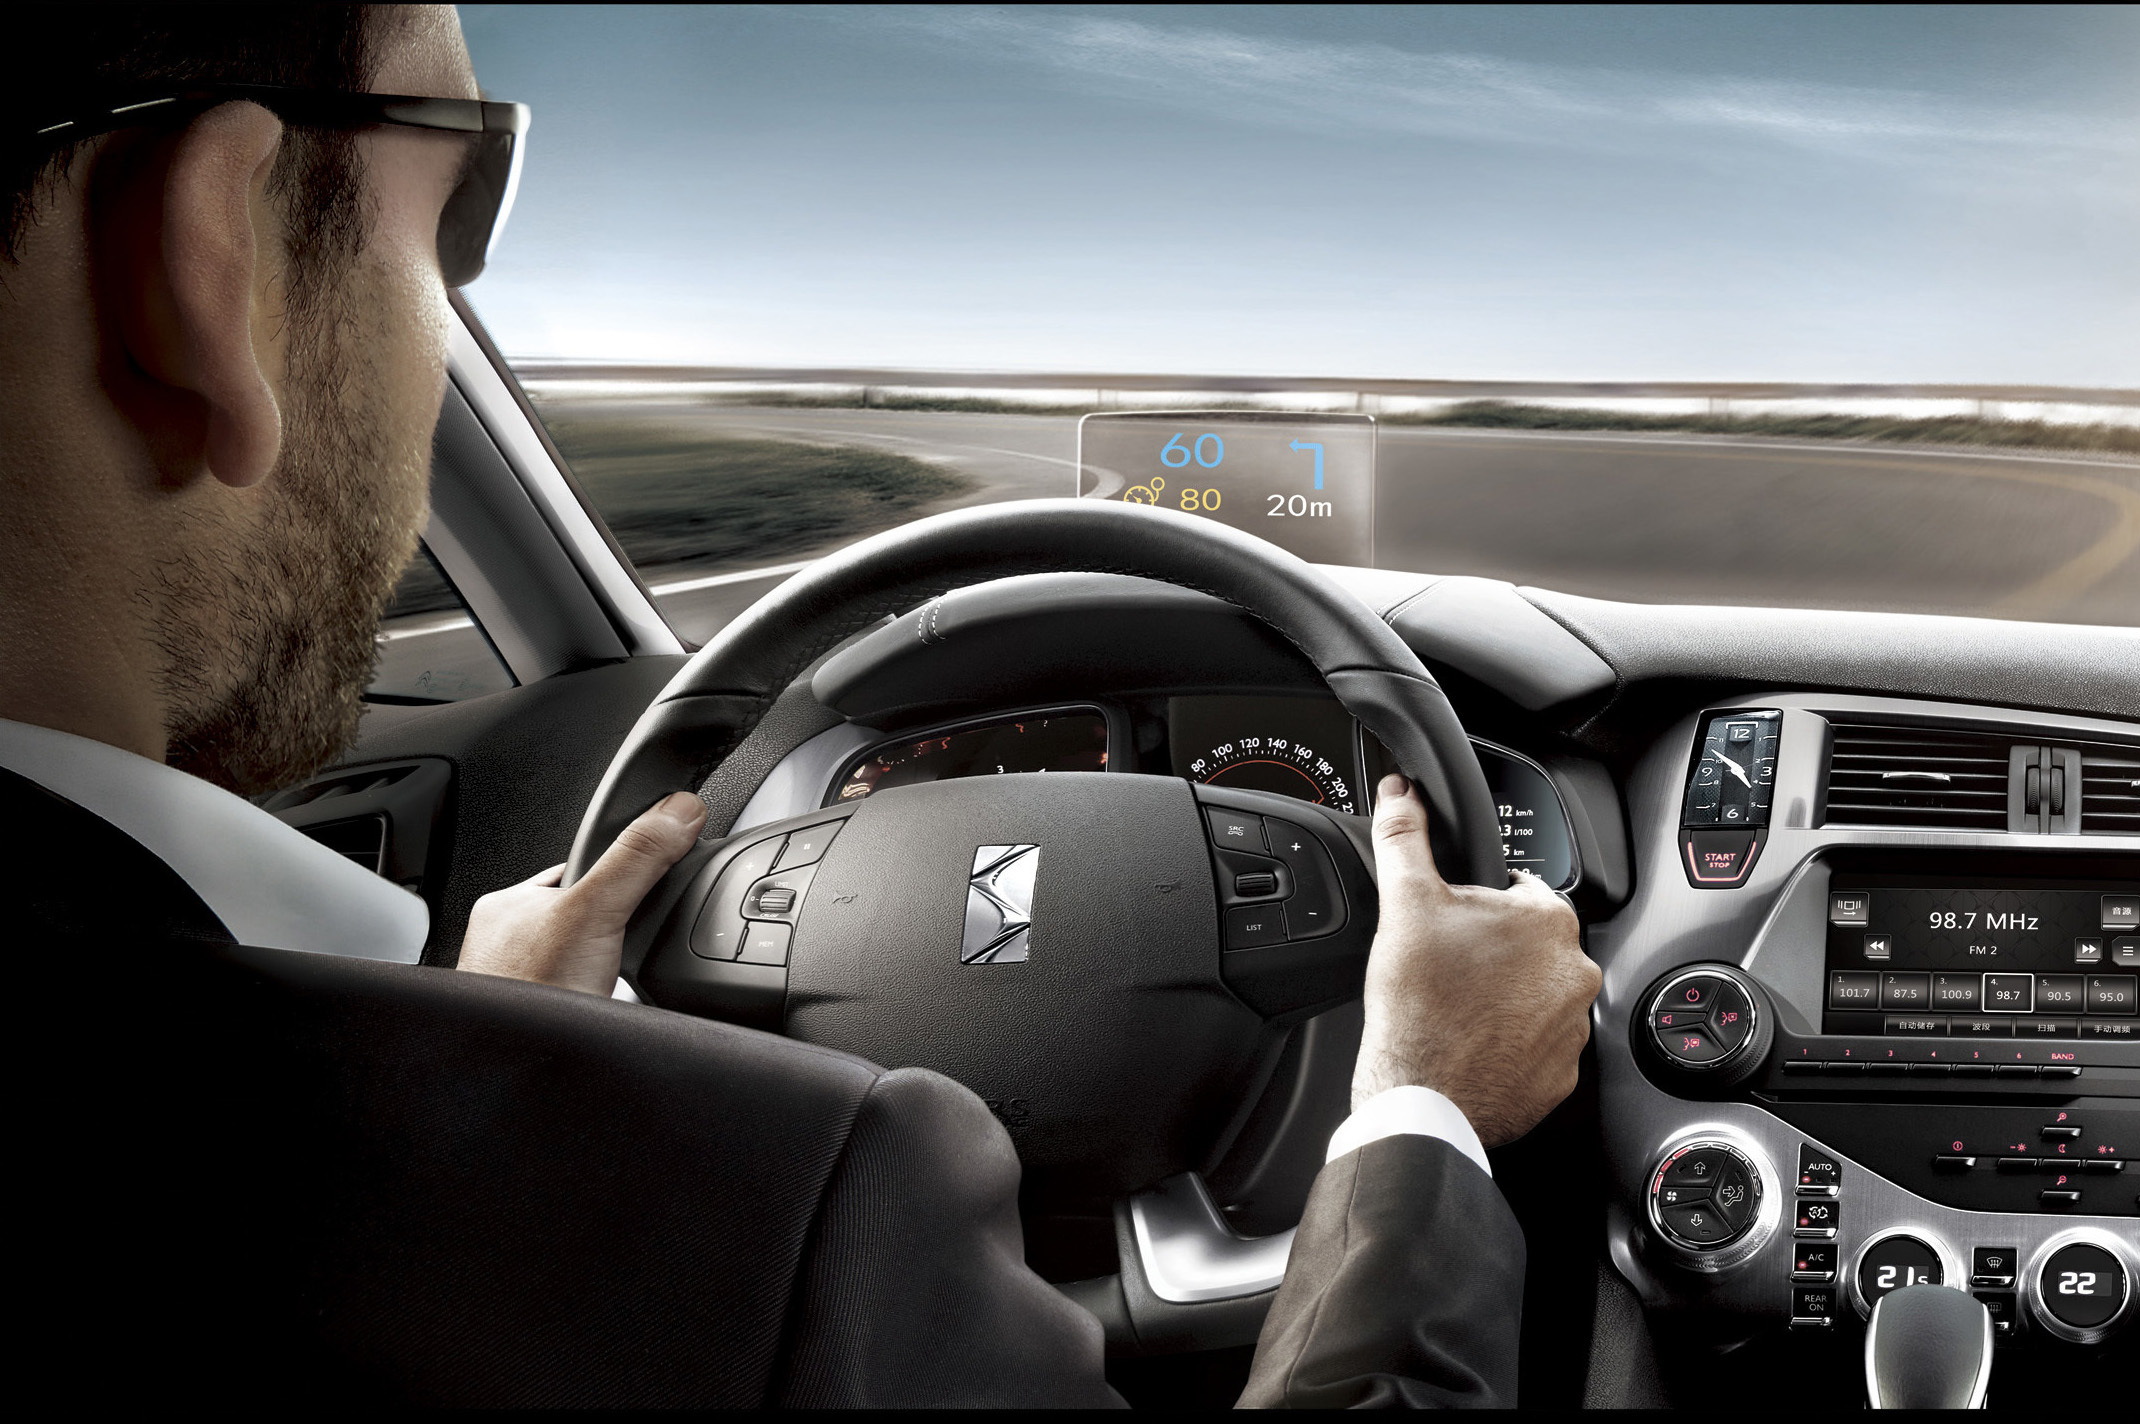 ADAS高级驾驶辅助系统进入高速发展期